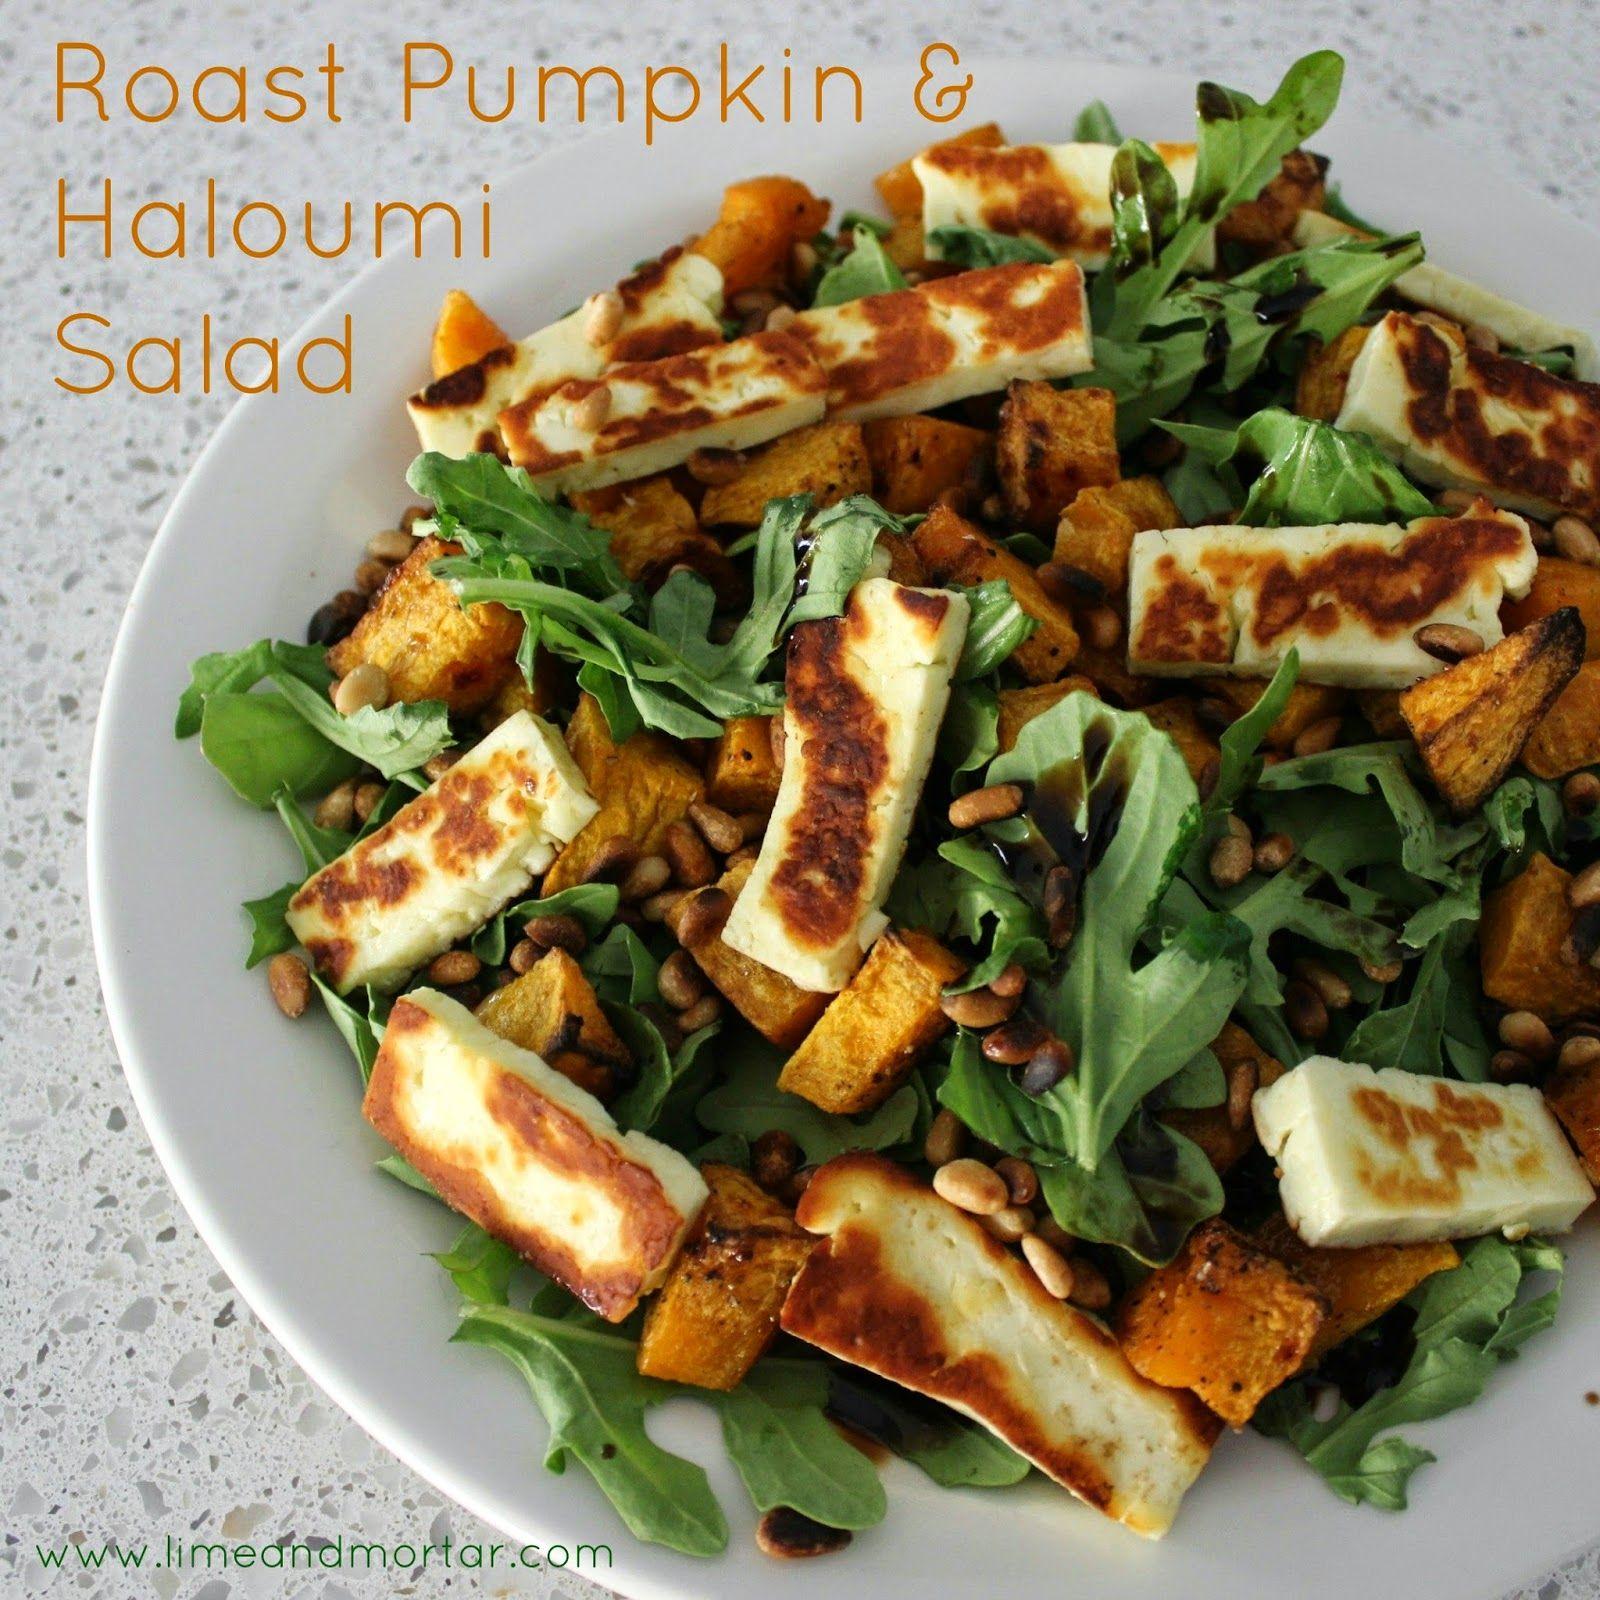 Recipe Roast Pumpkin Haloumi Salad Haloumi Recipes Recipes Roast Pumpkin Salad